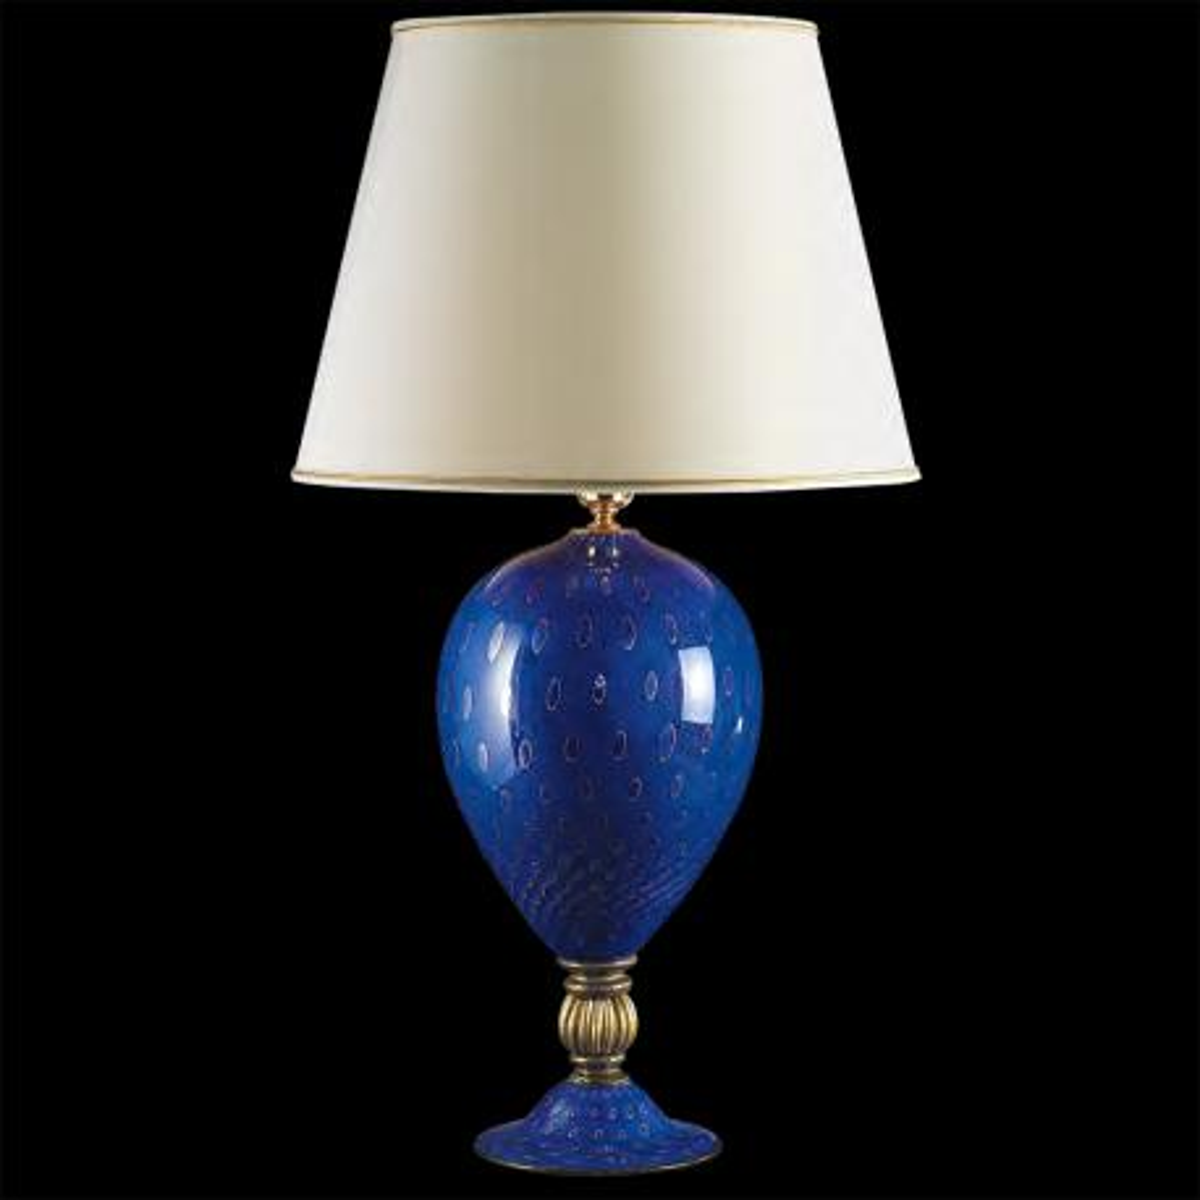 """Isidora"" lampe de table en verre de Murano - bleu"